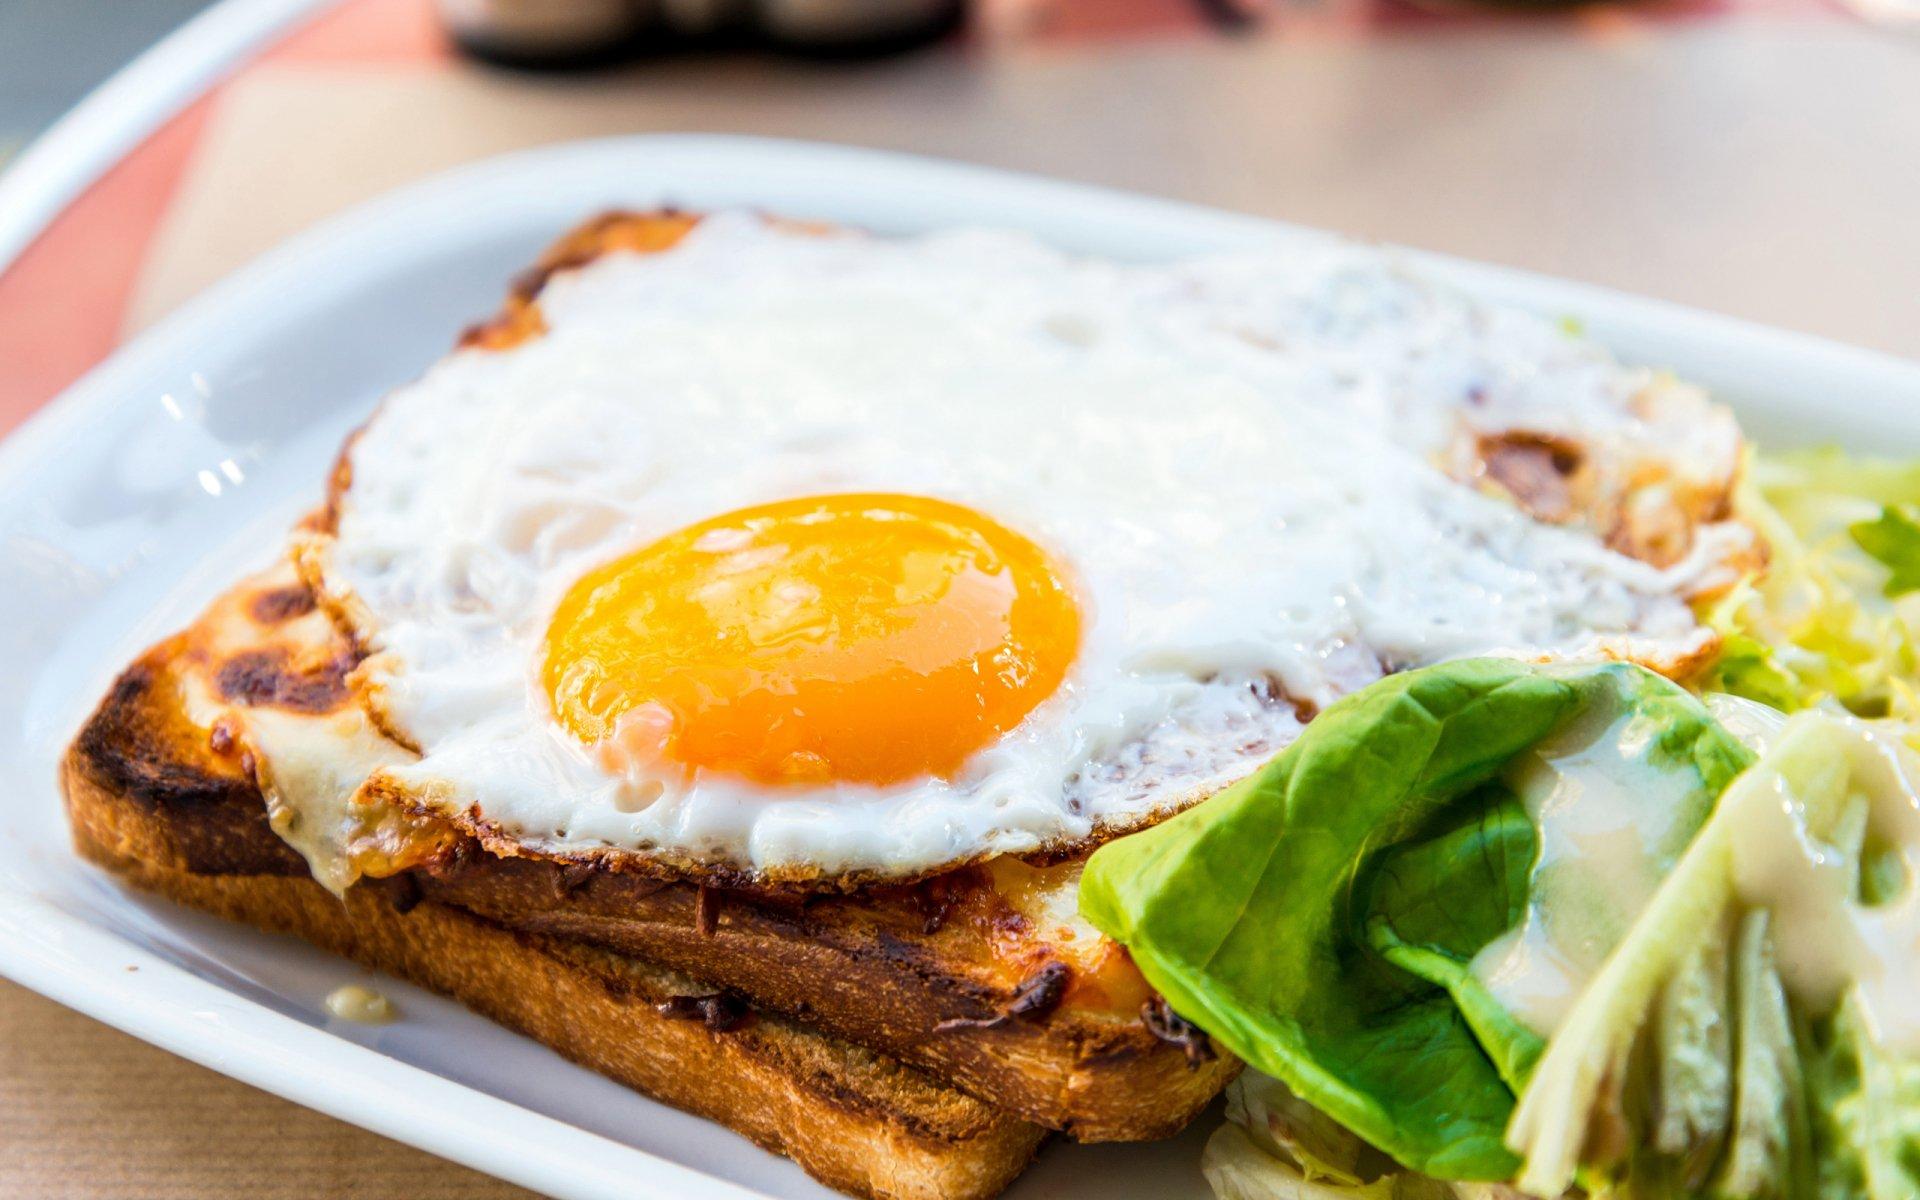 wallpapers breakfast food: Breakfast Full HD Wallpaper And Background Image